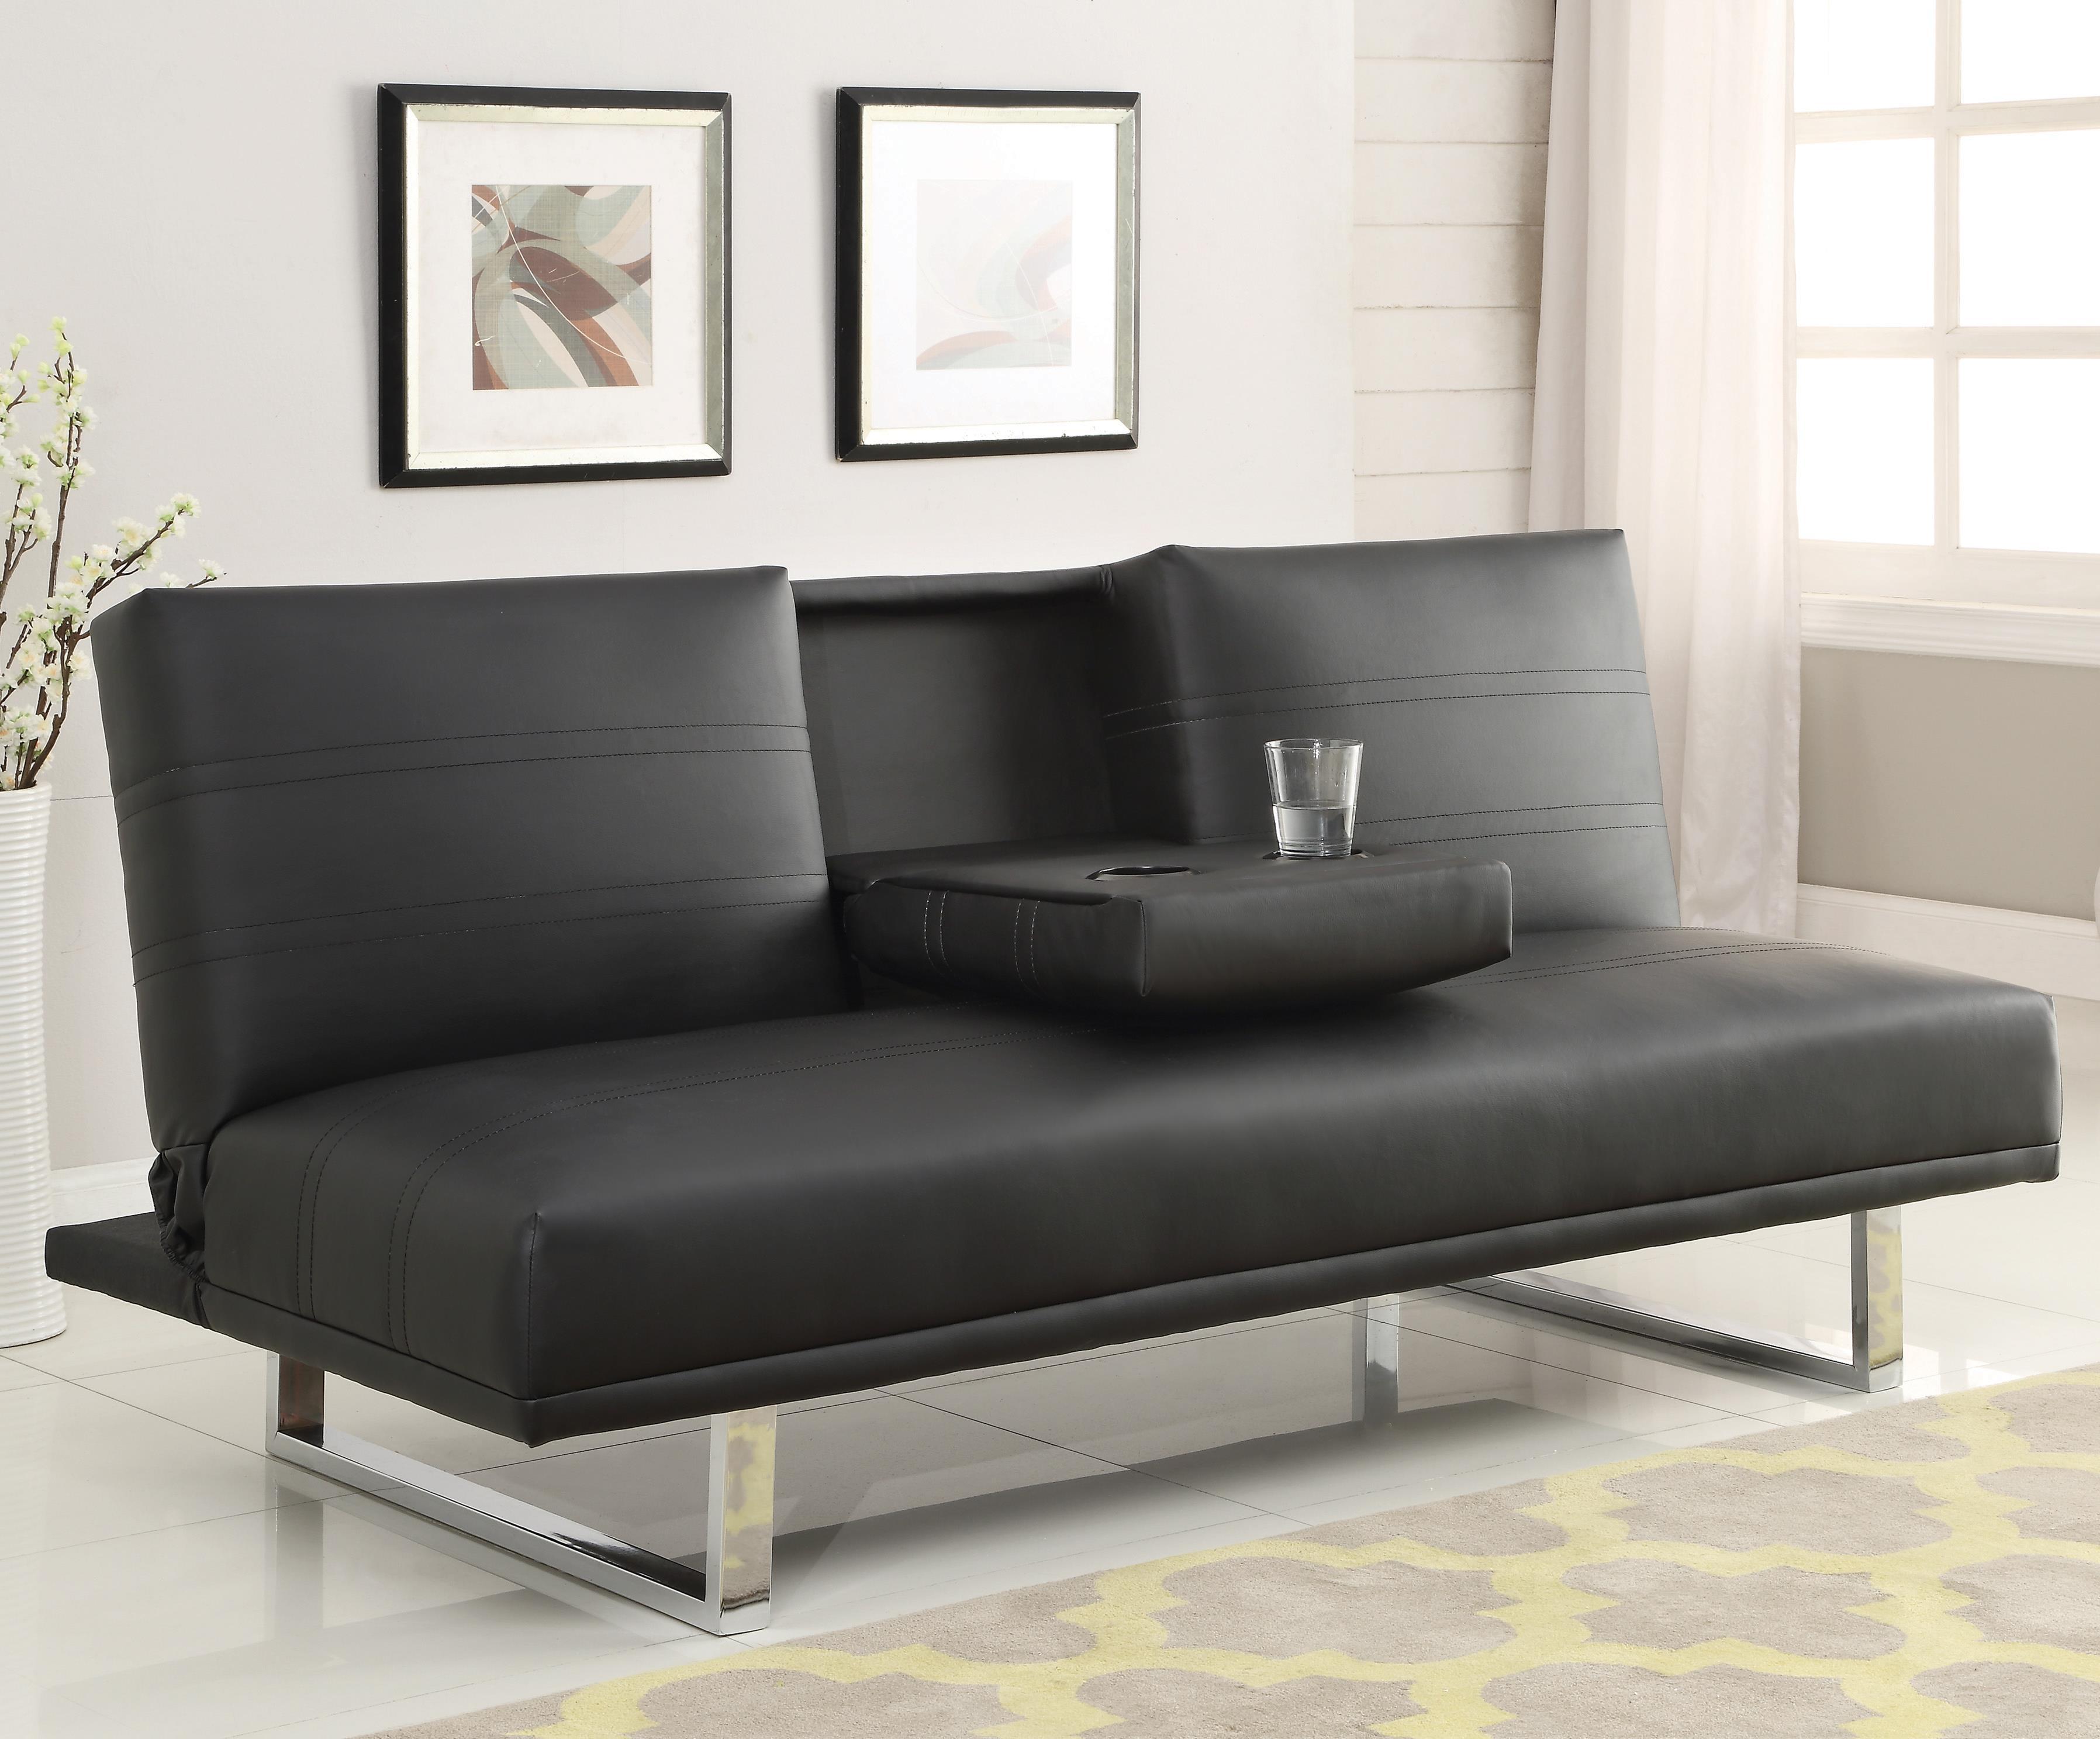 Sofa Beds And Futons Contemporary Sofa Bed With Chrome Legs Quality Furni